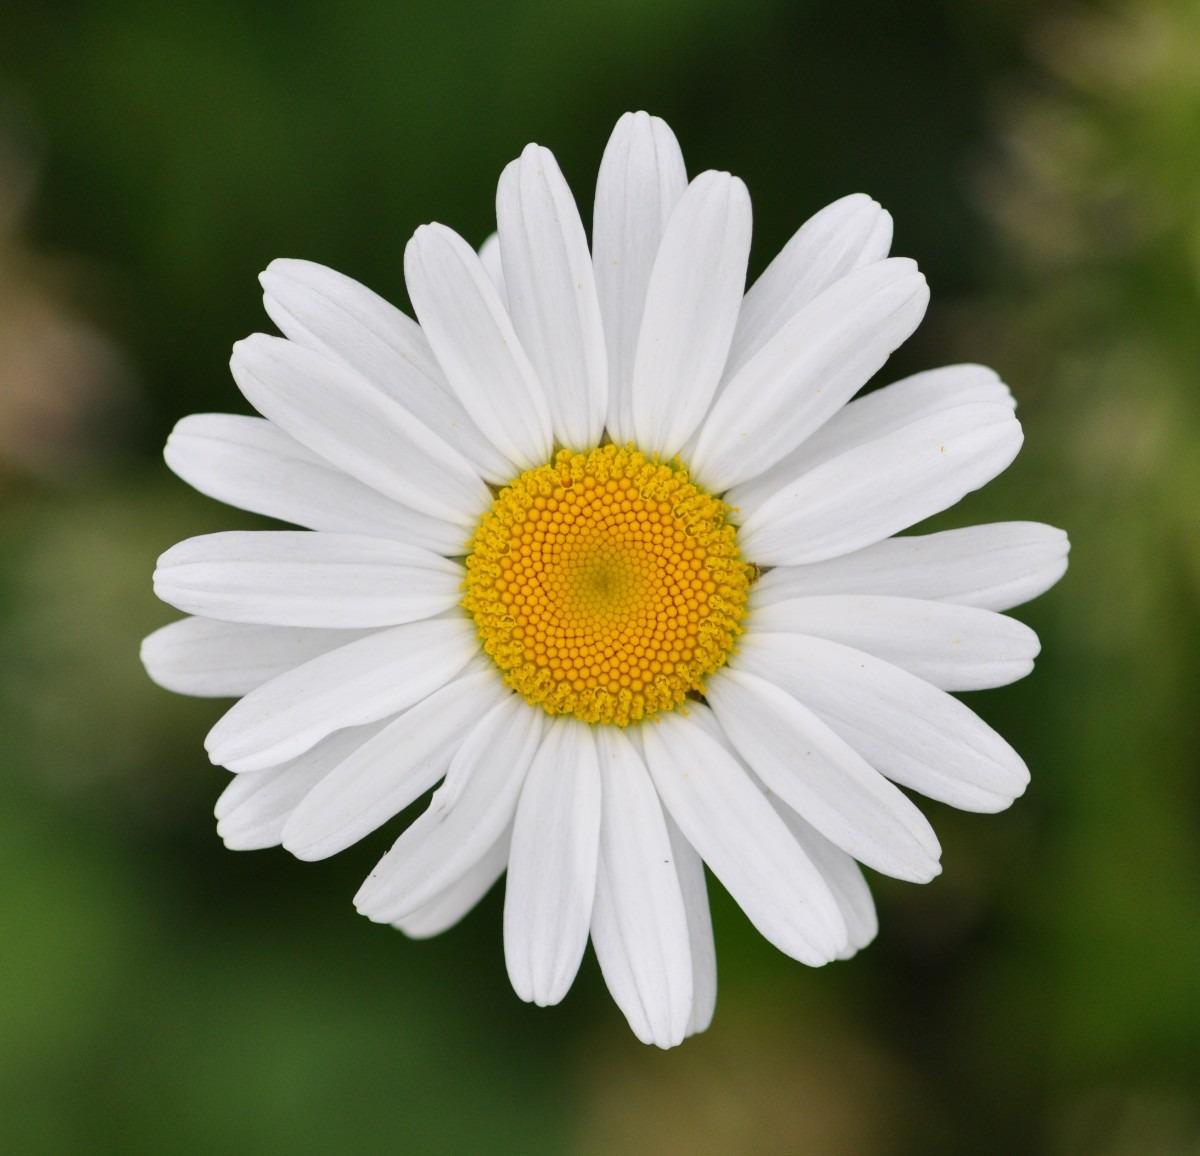 Margarida igui ecologia - Image fleur marguerite ...